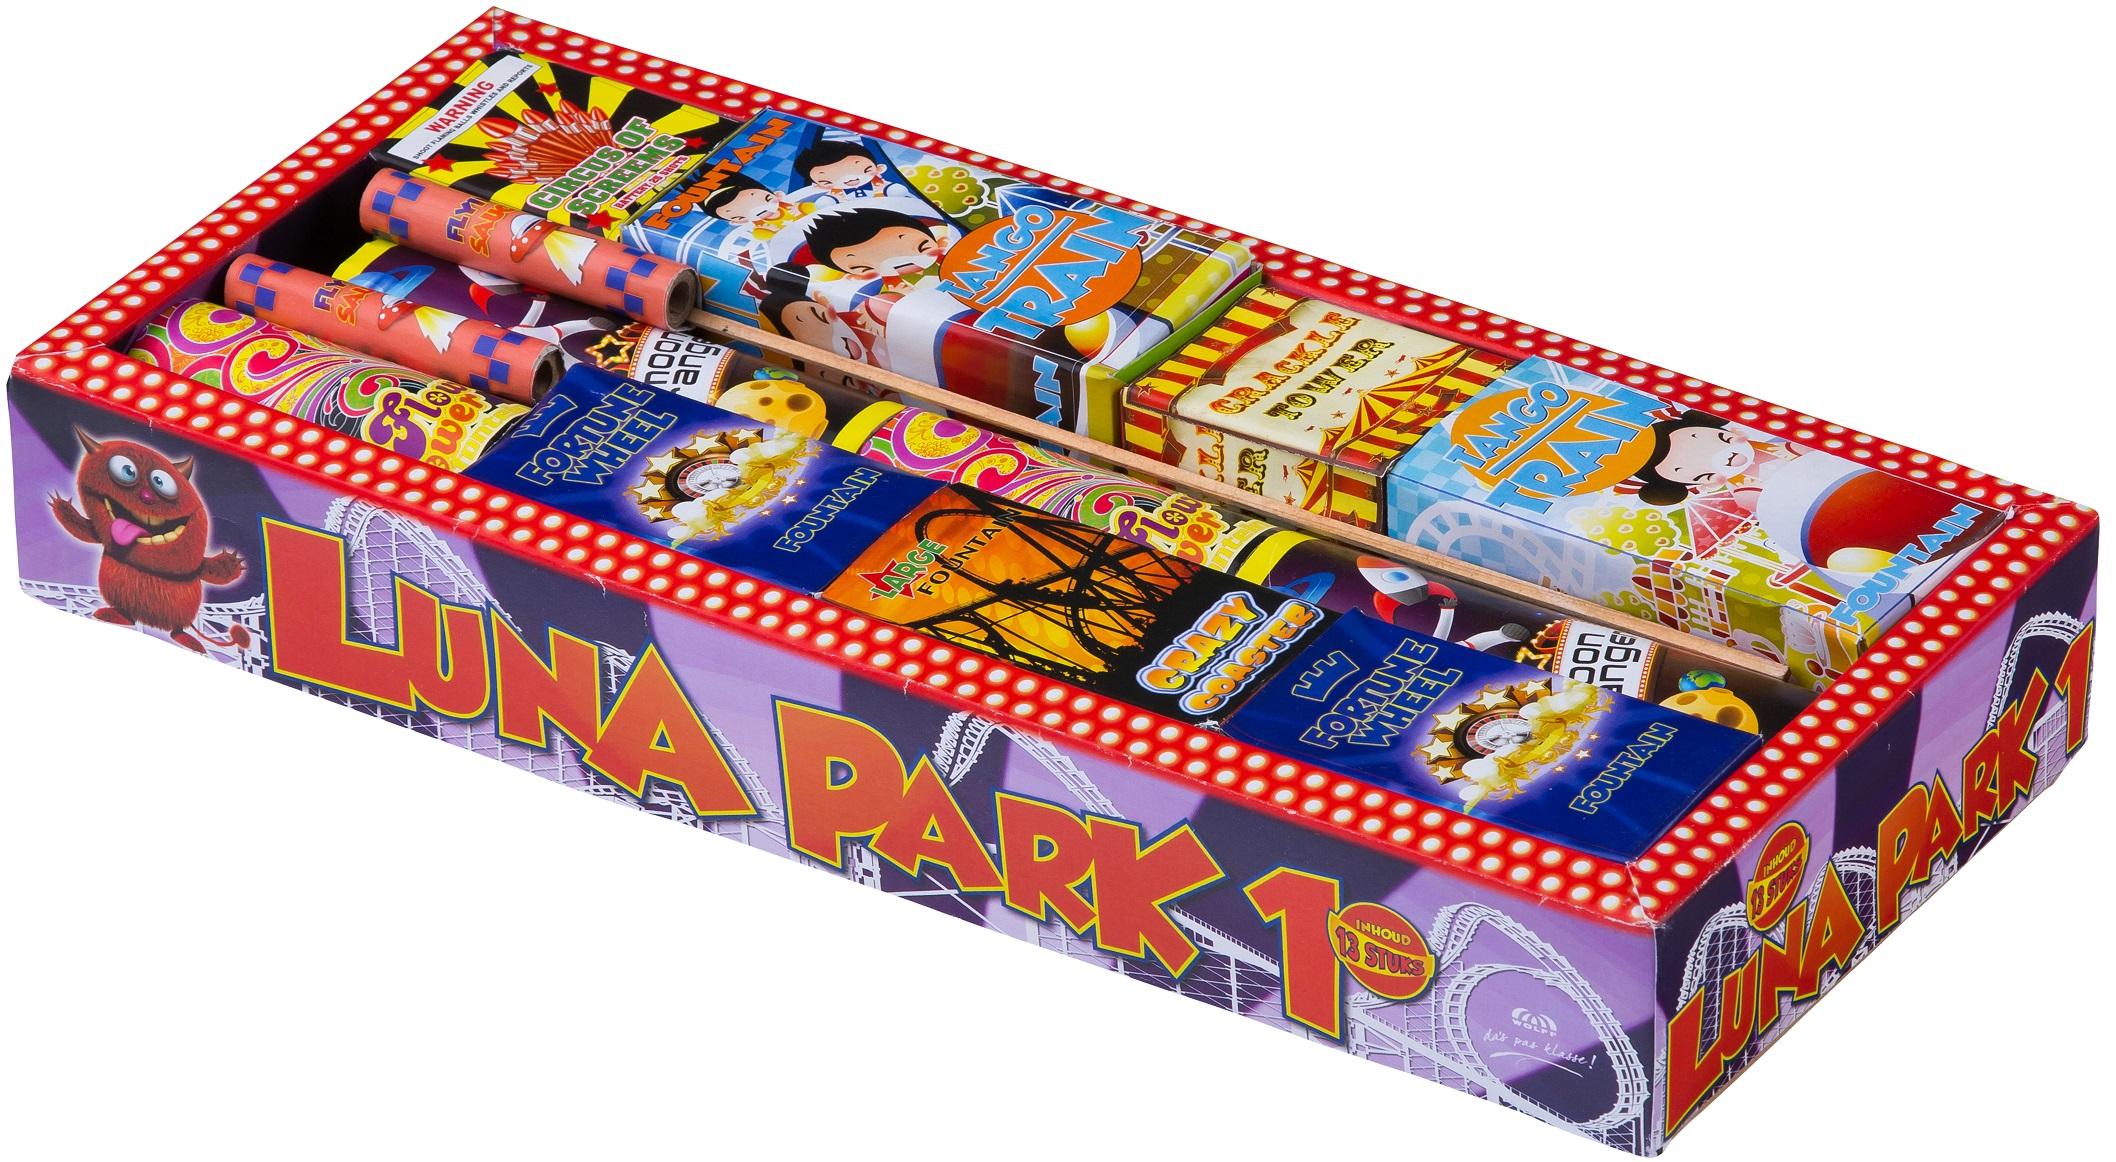 Luna park 1